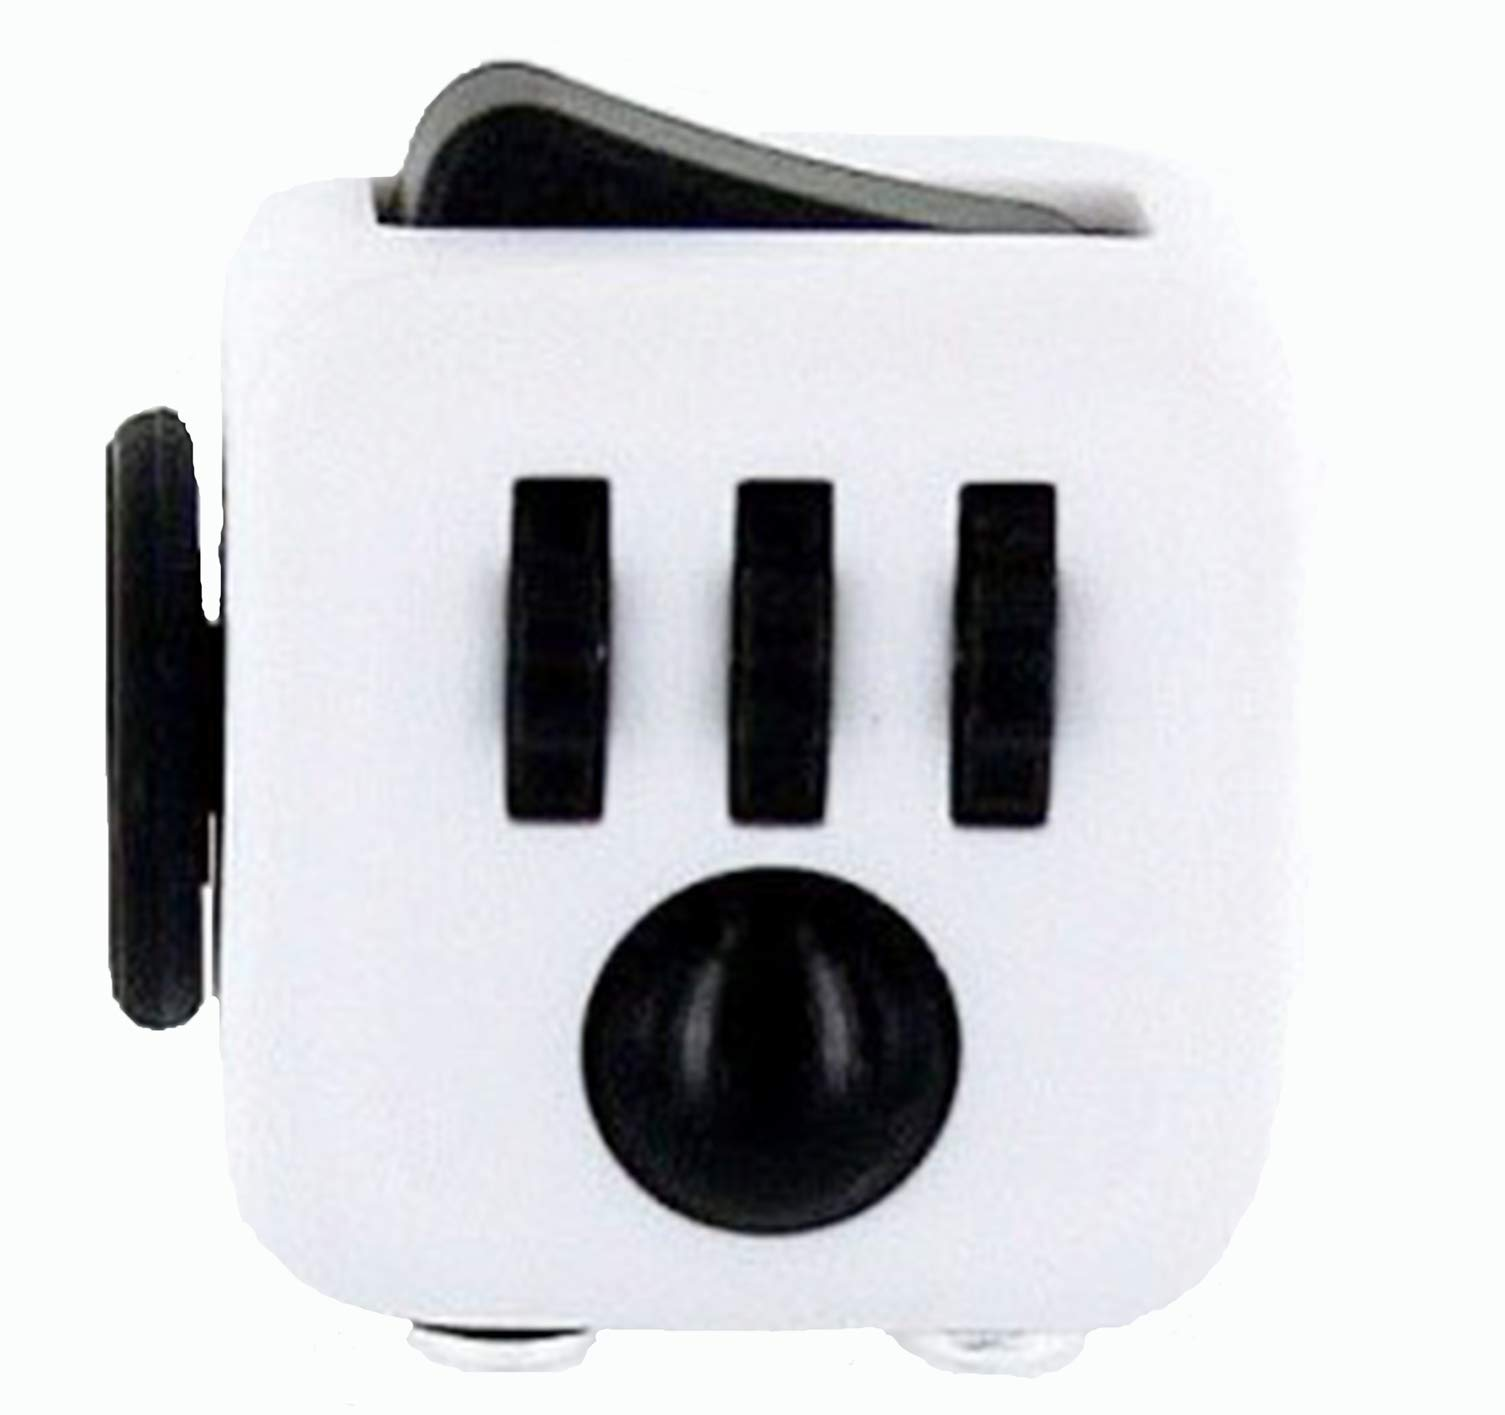 ZURU Fidget Cube by Antsy Labs White/Black - The Original and Still the Best Anti-Stress Toy, Fidget Toy Designed to Help you Focus by ZURU